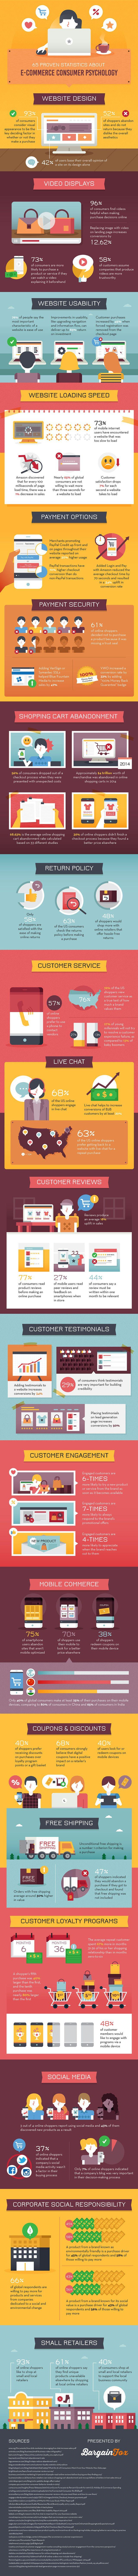 20 Key Factors Impacting E-Commerce Consumer Behavior – Marketing Technology